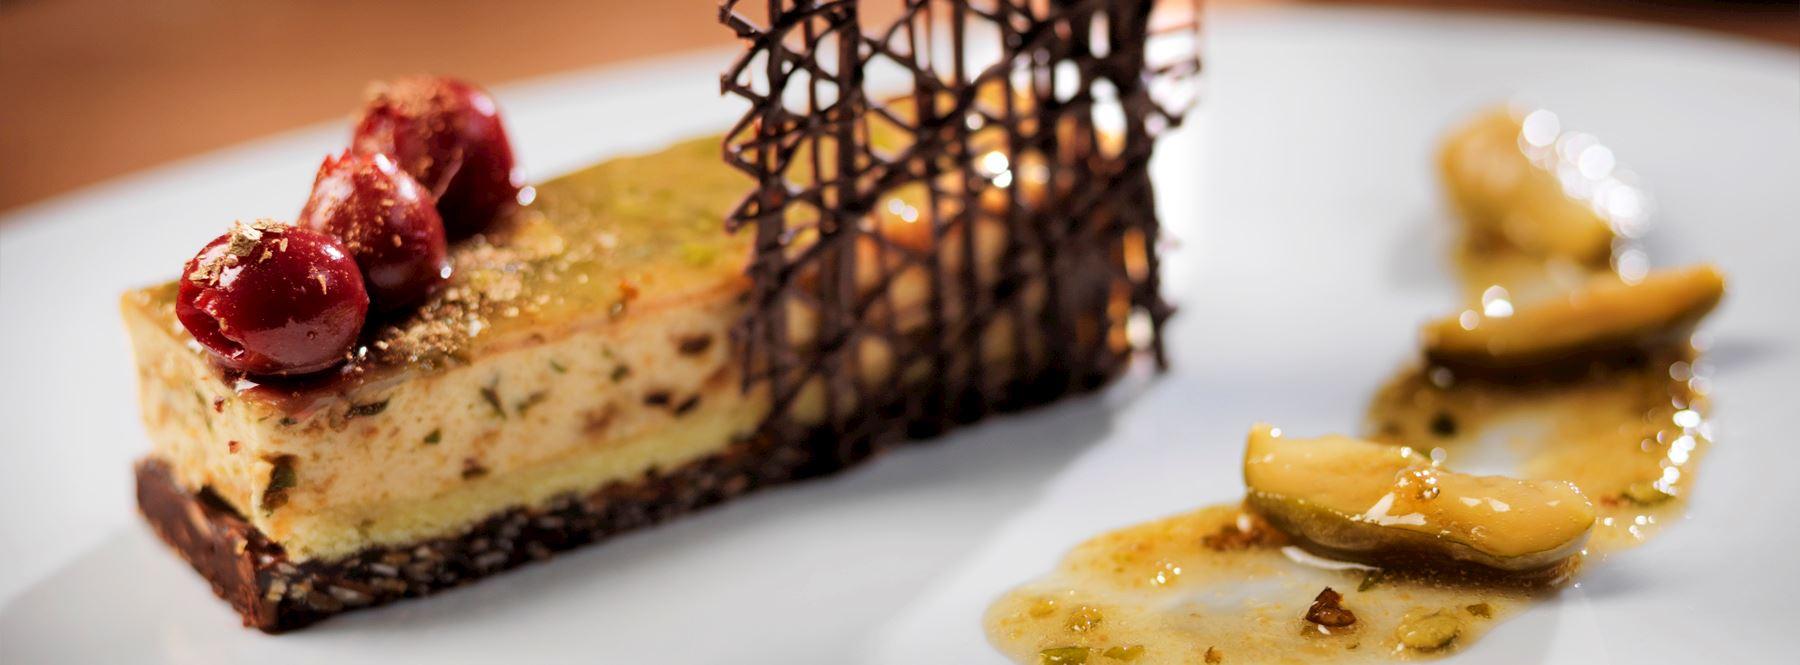 Mouthwatering dessert